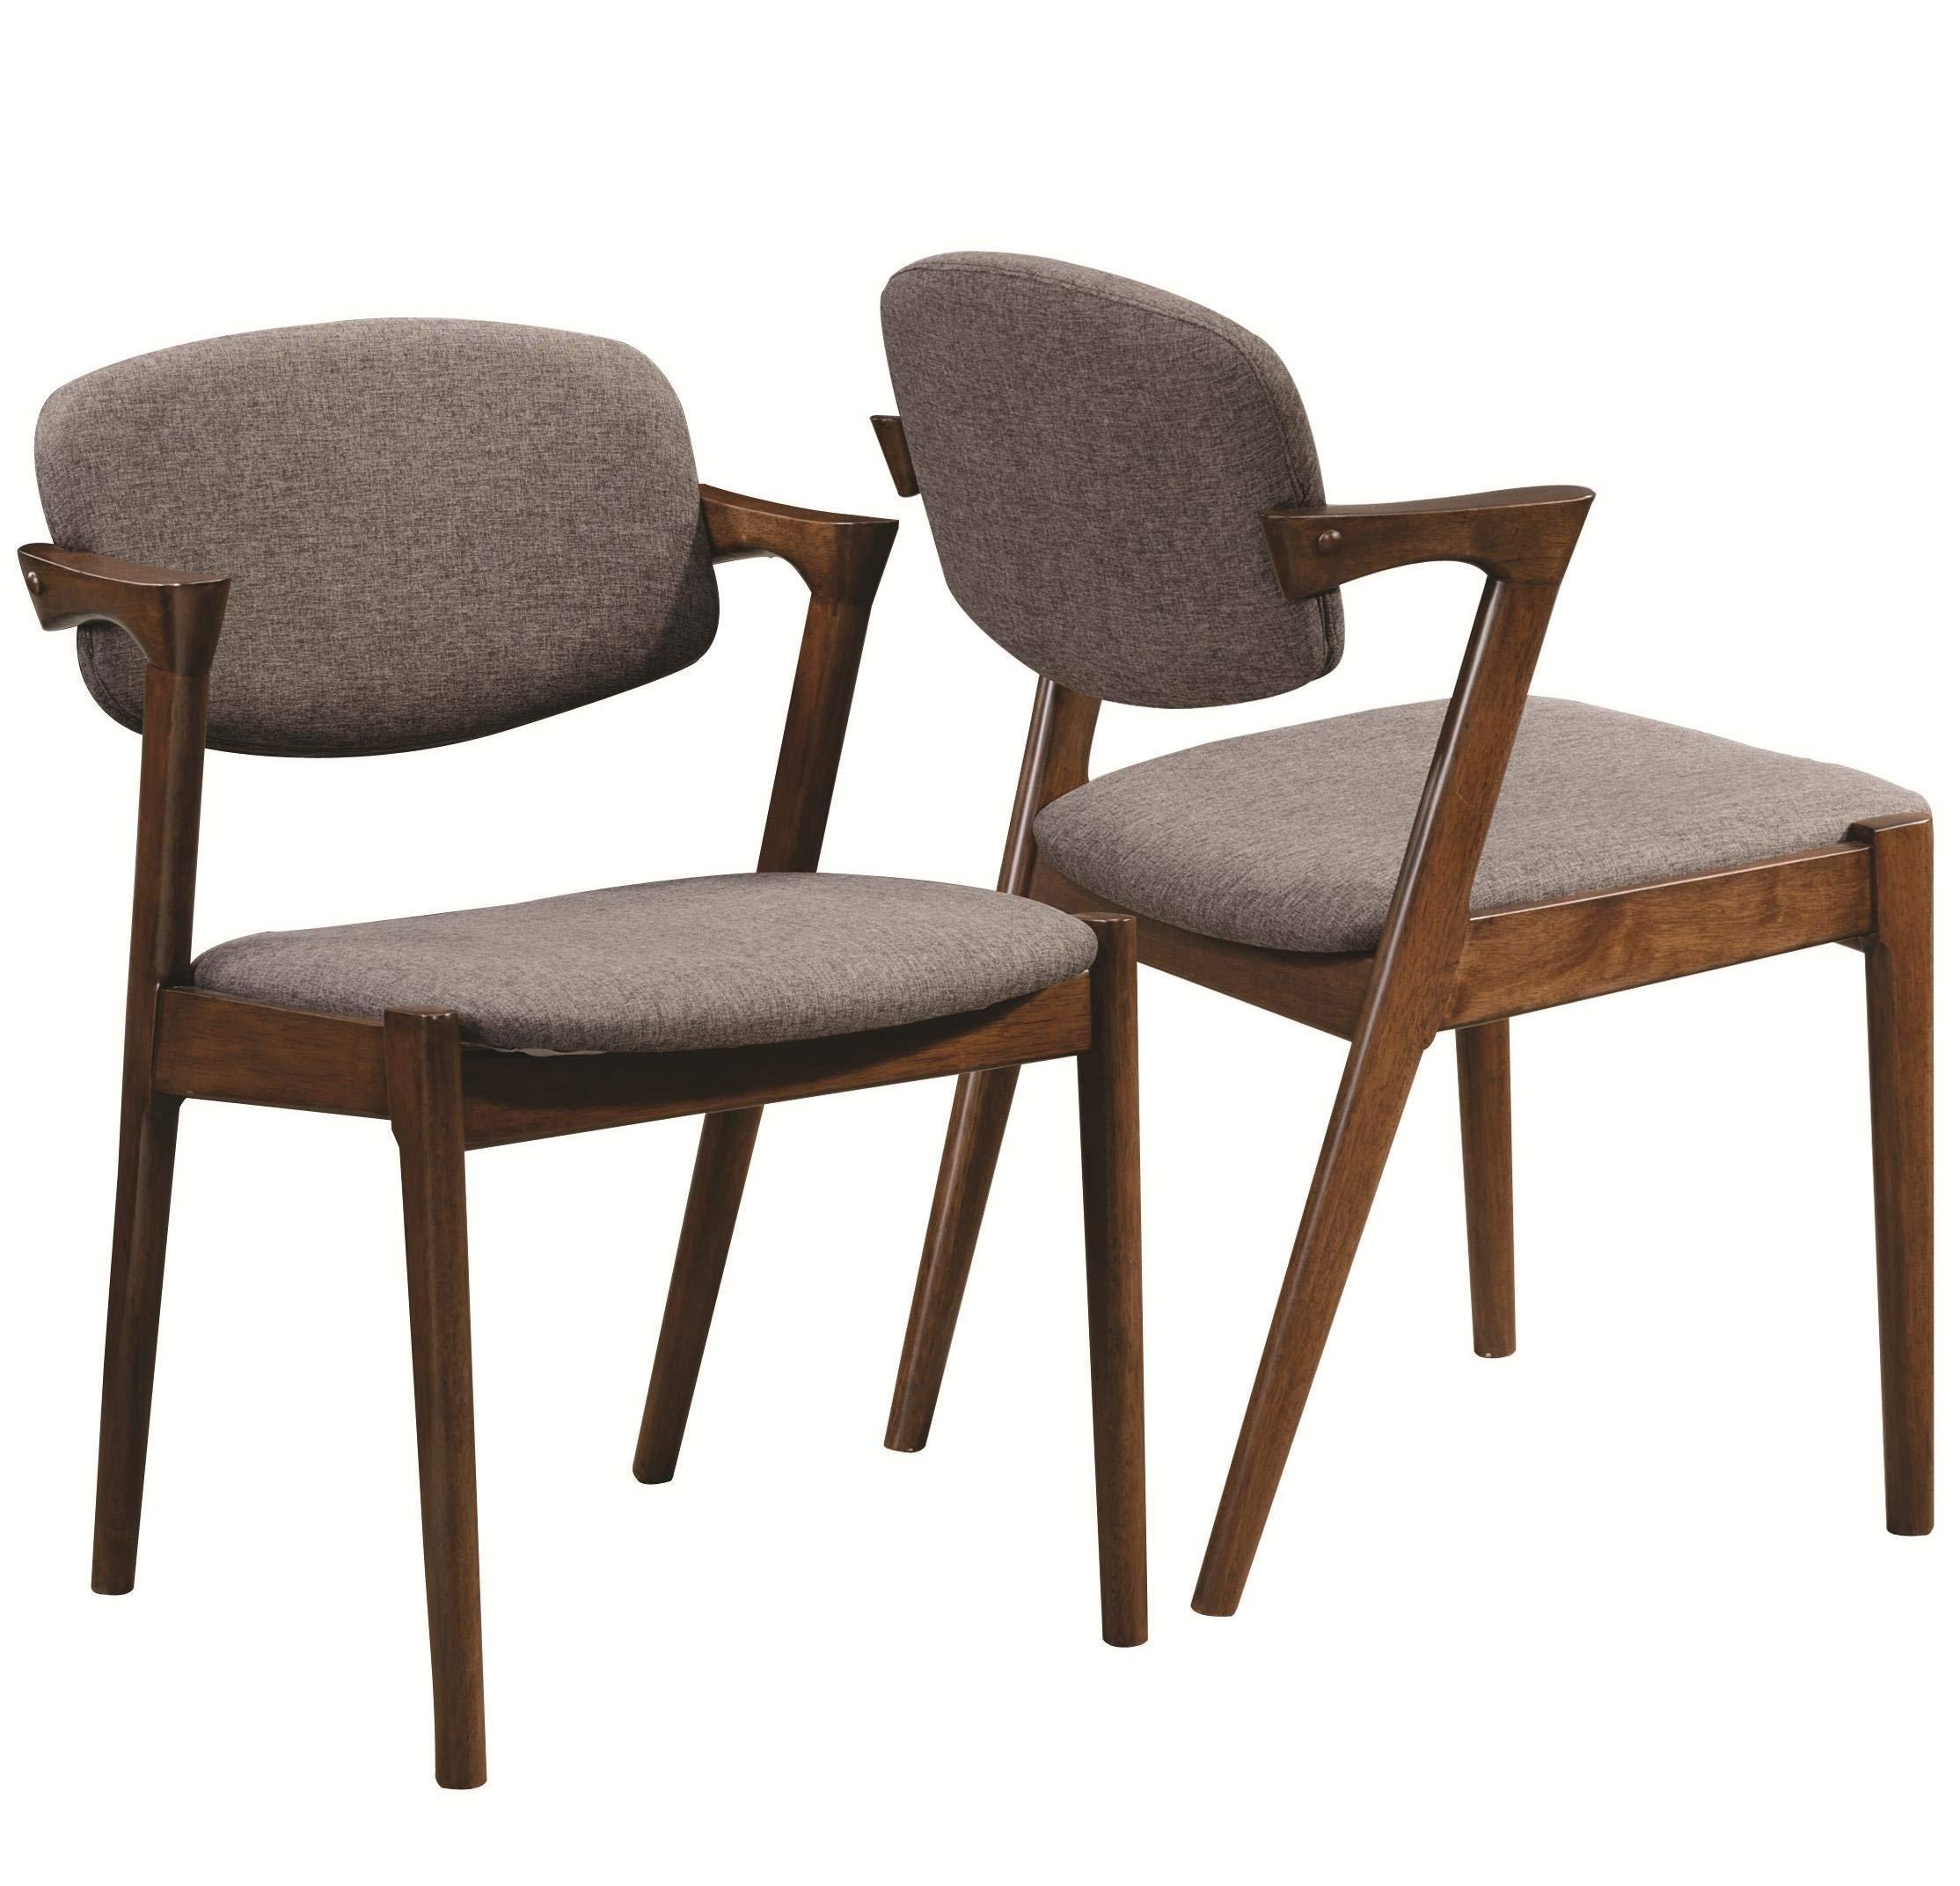 Modern Teak Dining Chairs Chair Pads Amp Cushions